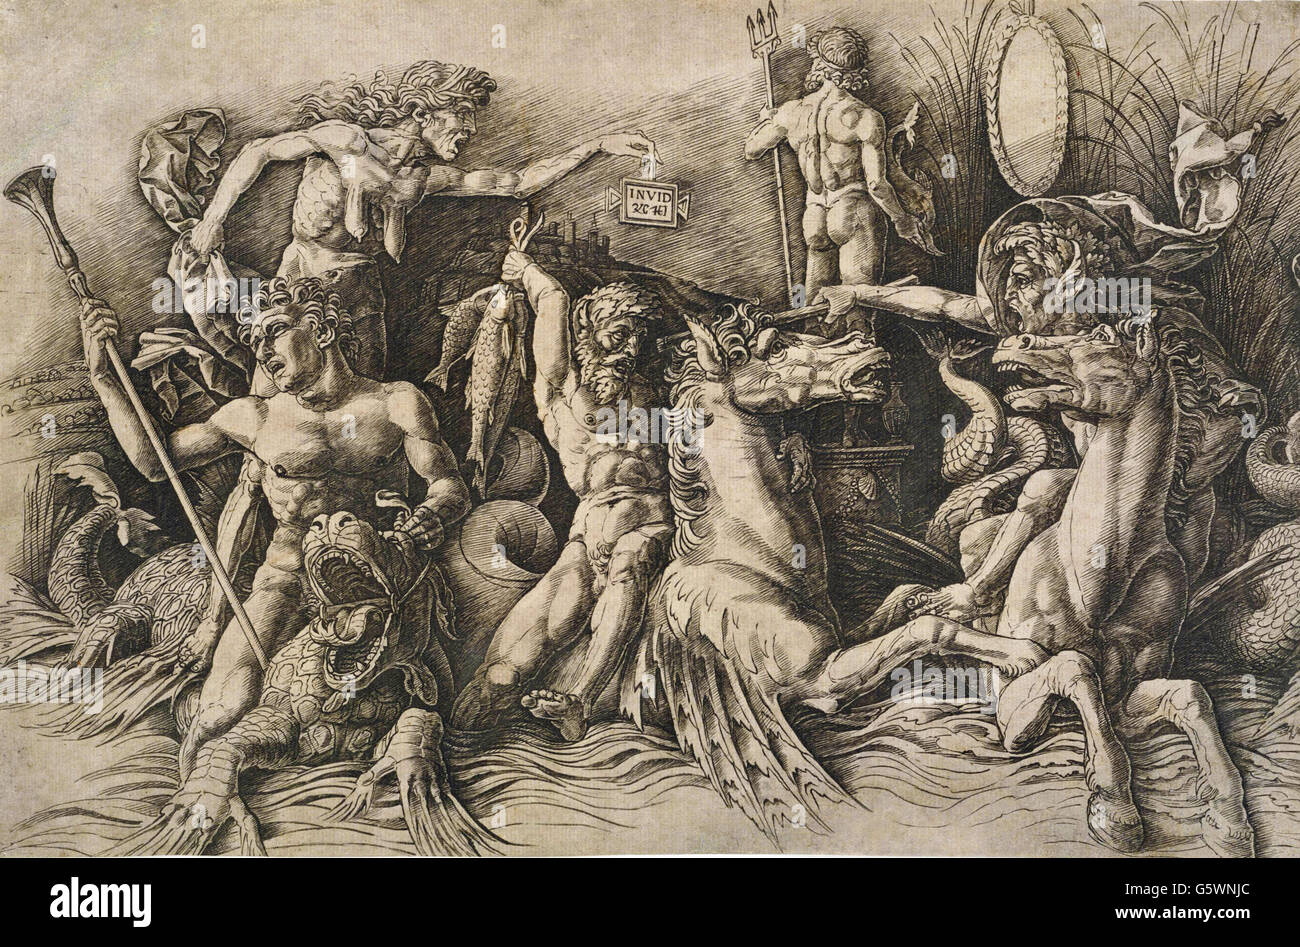 Andrea Mantegna - The Battle of the Sea Gods (the Left Half) - - Stock Image